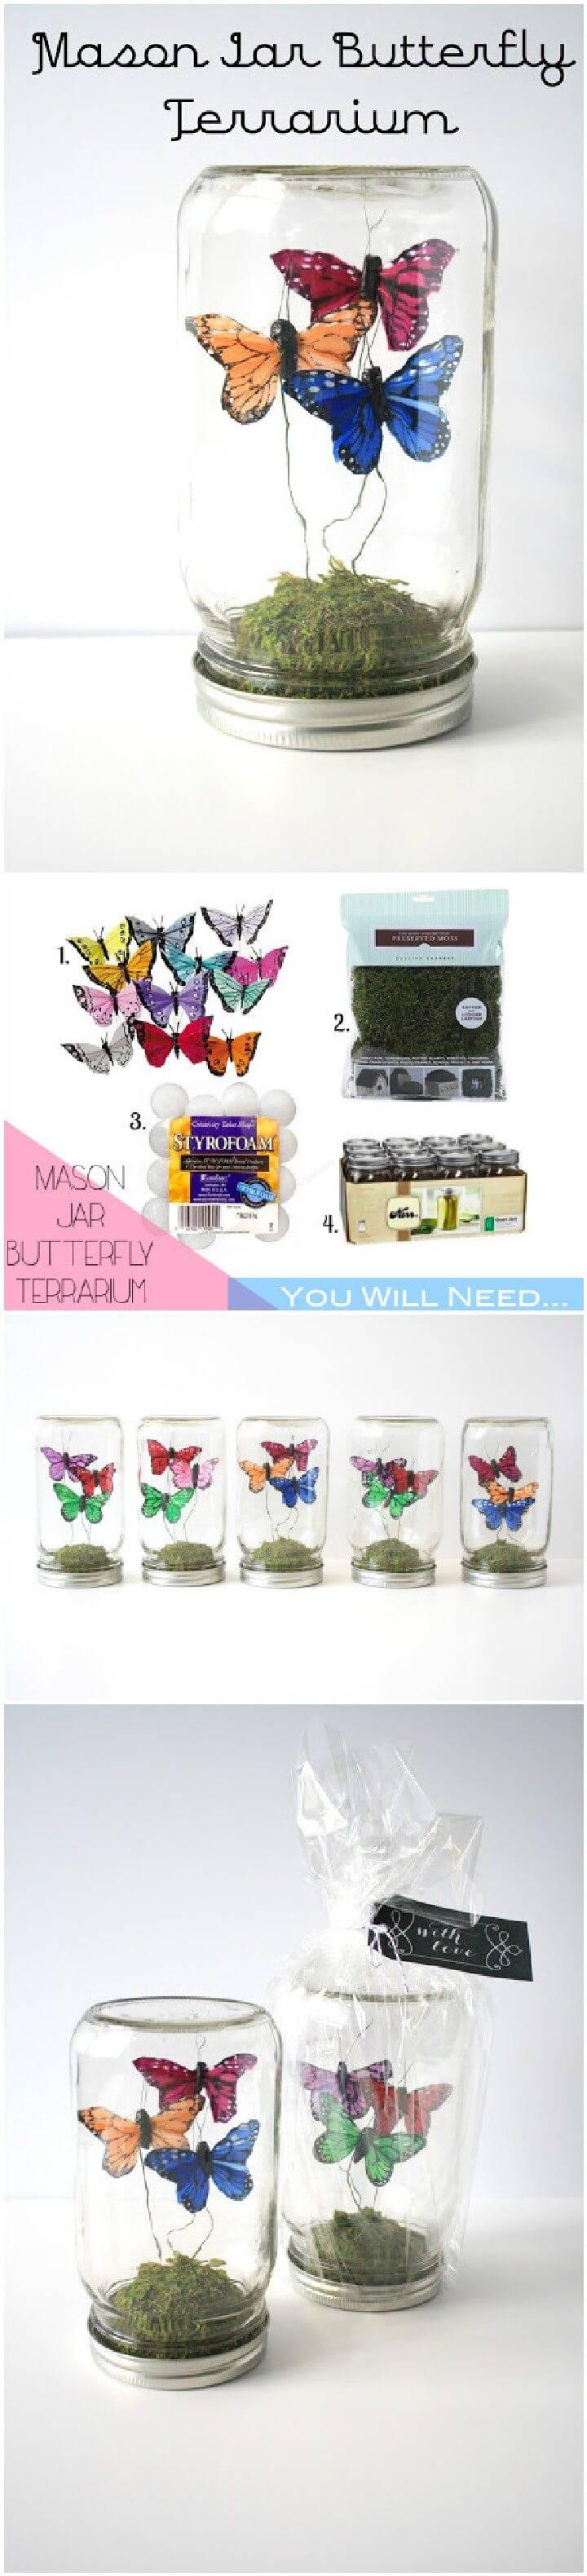 DIY Mason Jar Butterfly Terrarium Gifts